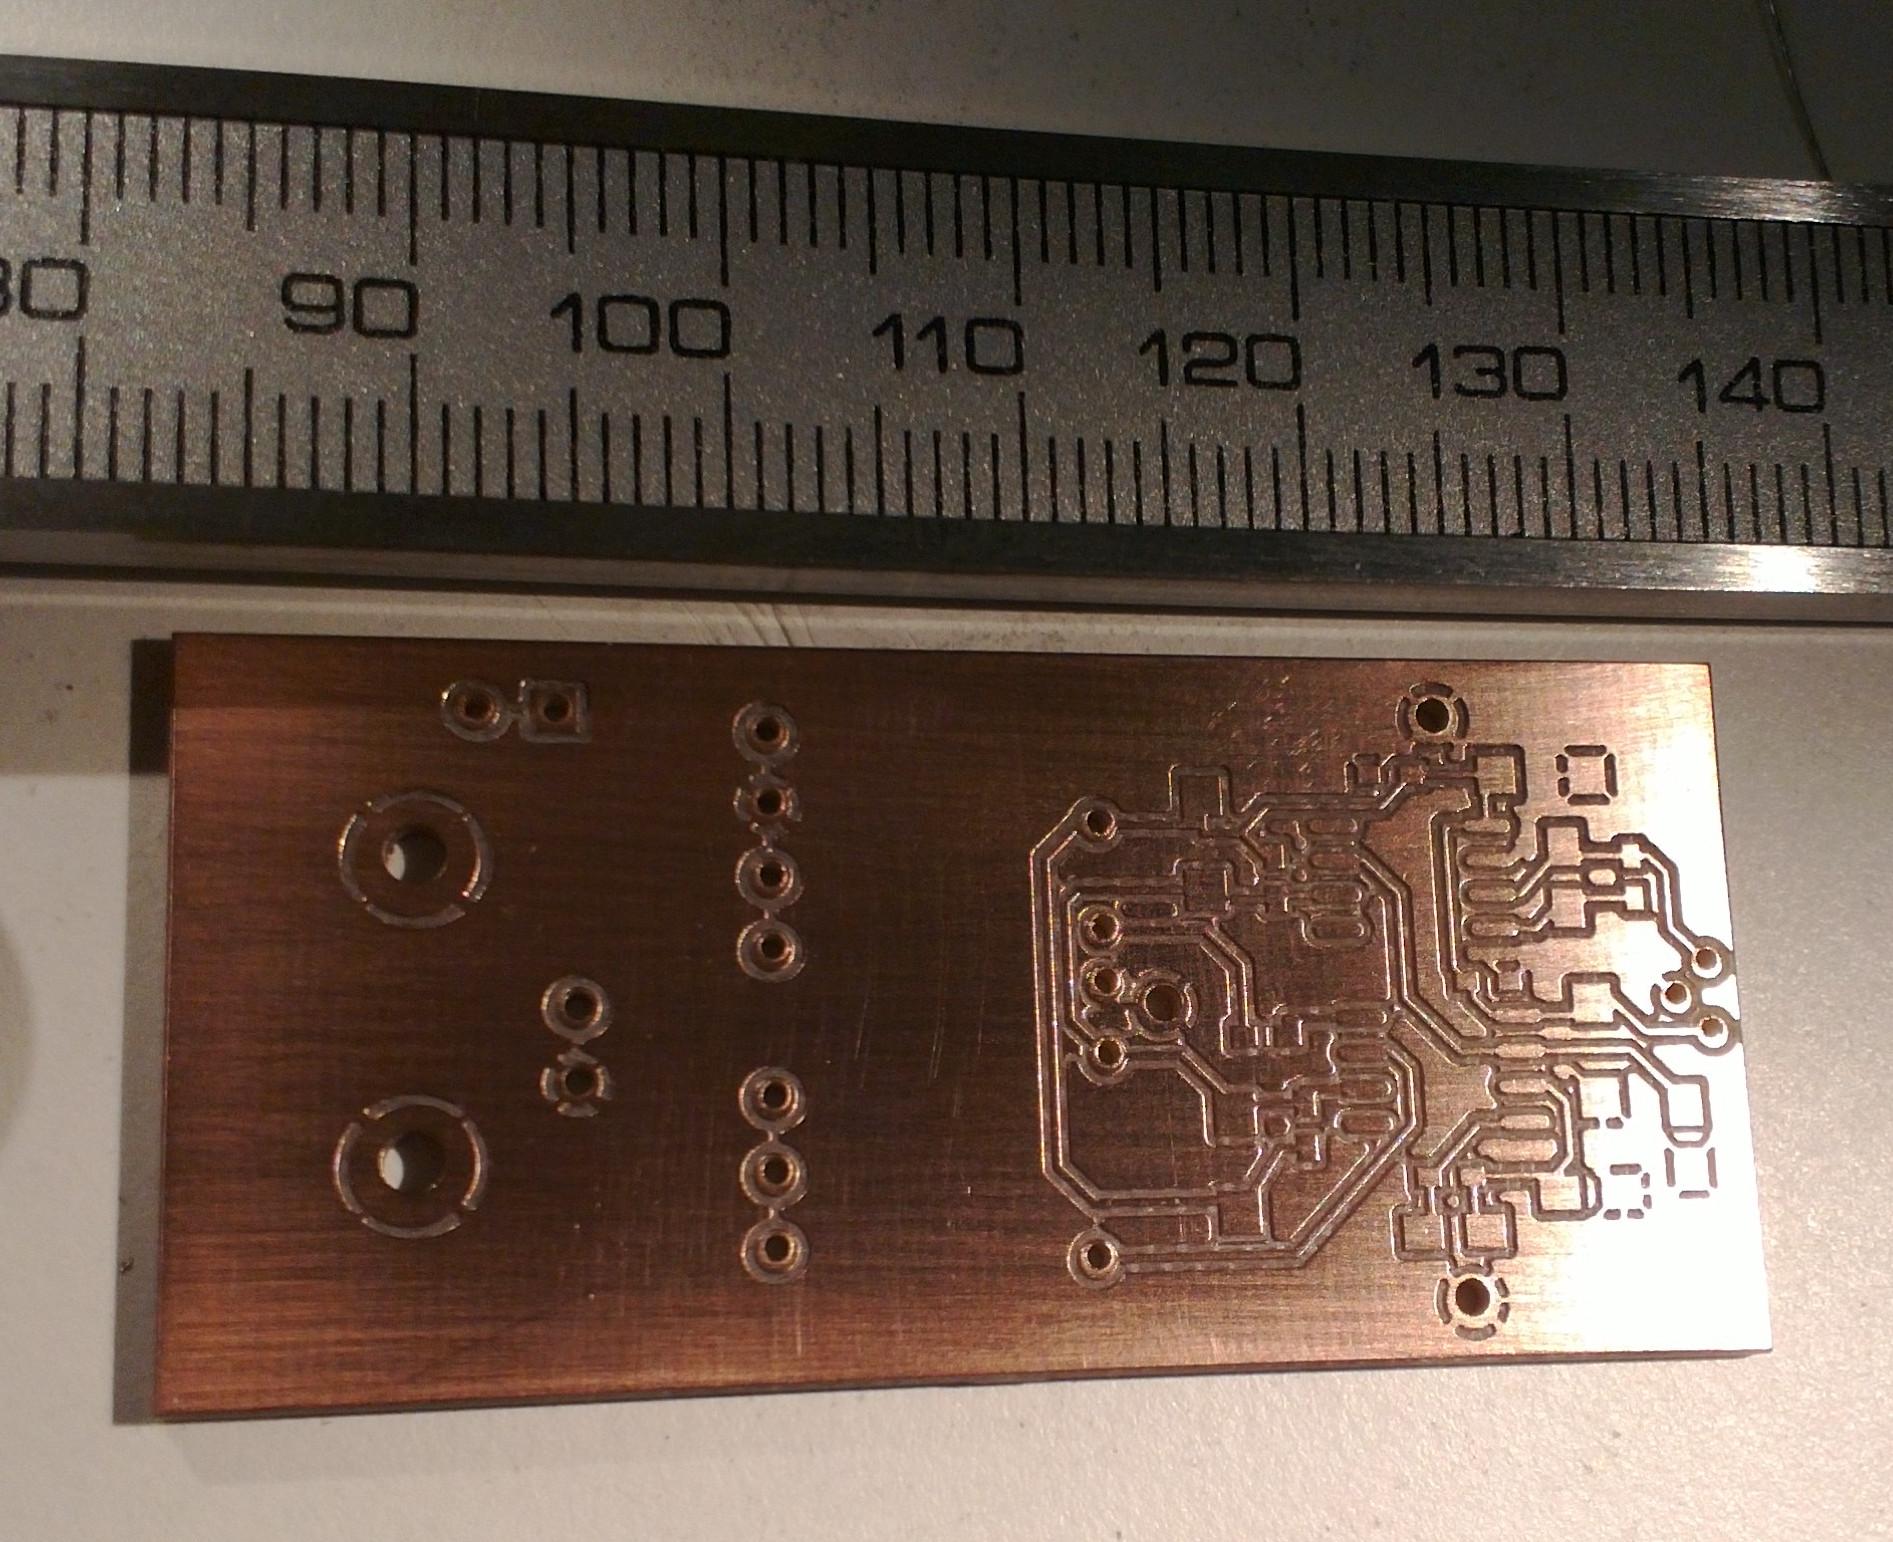 January 2013 Transimpedance Amplifier Wikipedia Beat Amp Pcb Bottom Top